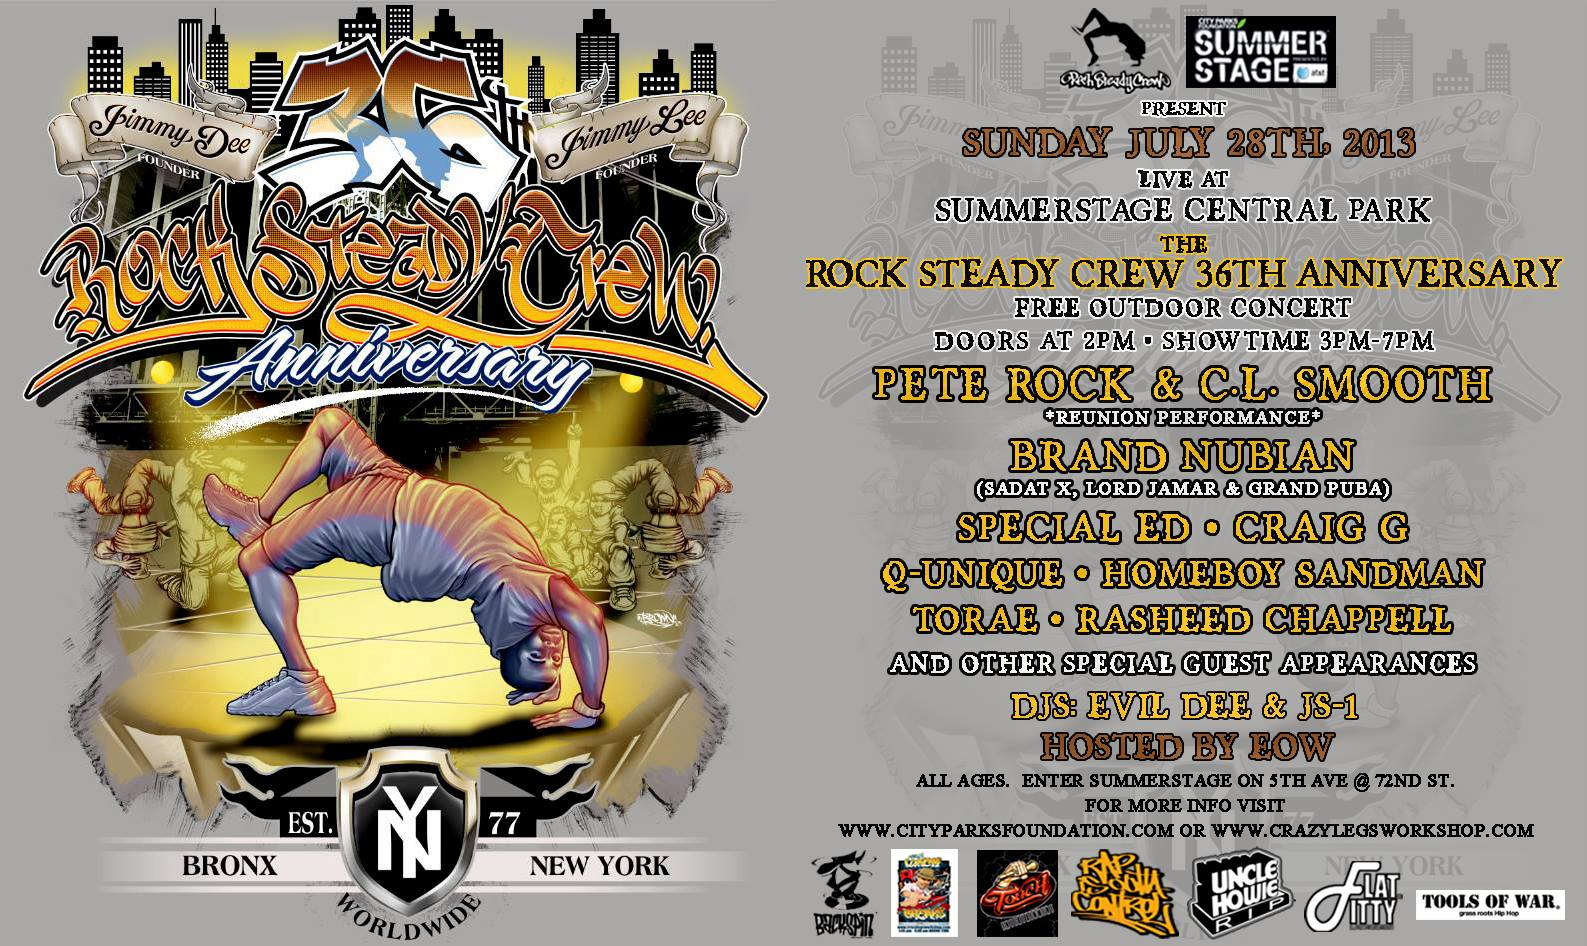 Rock-Steady-Crew-36th-Anniversary.jpg